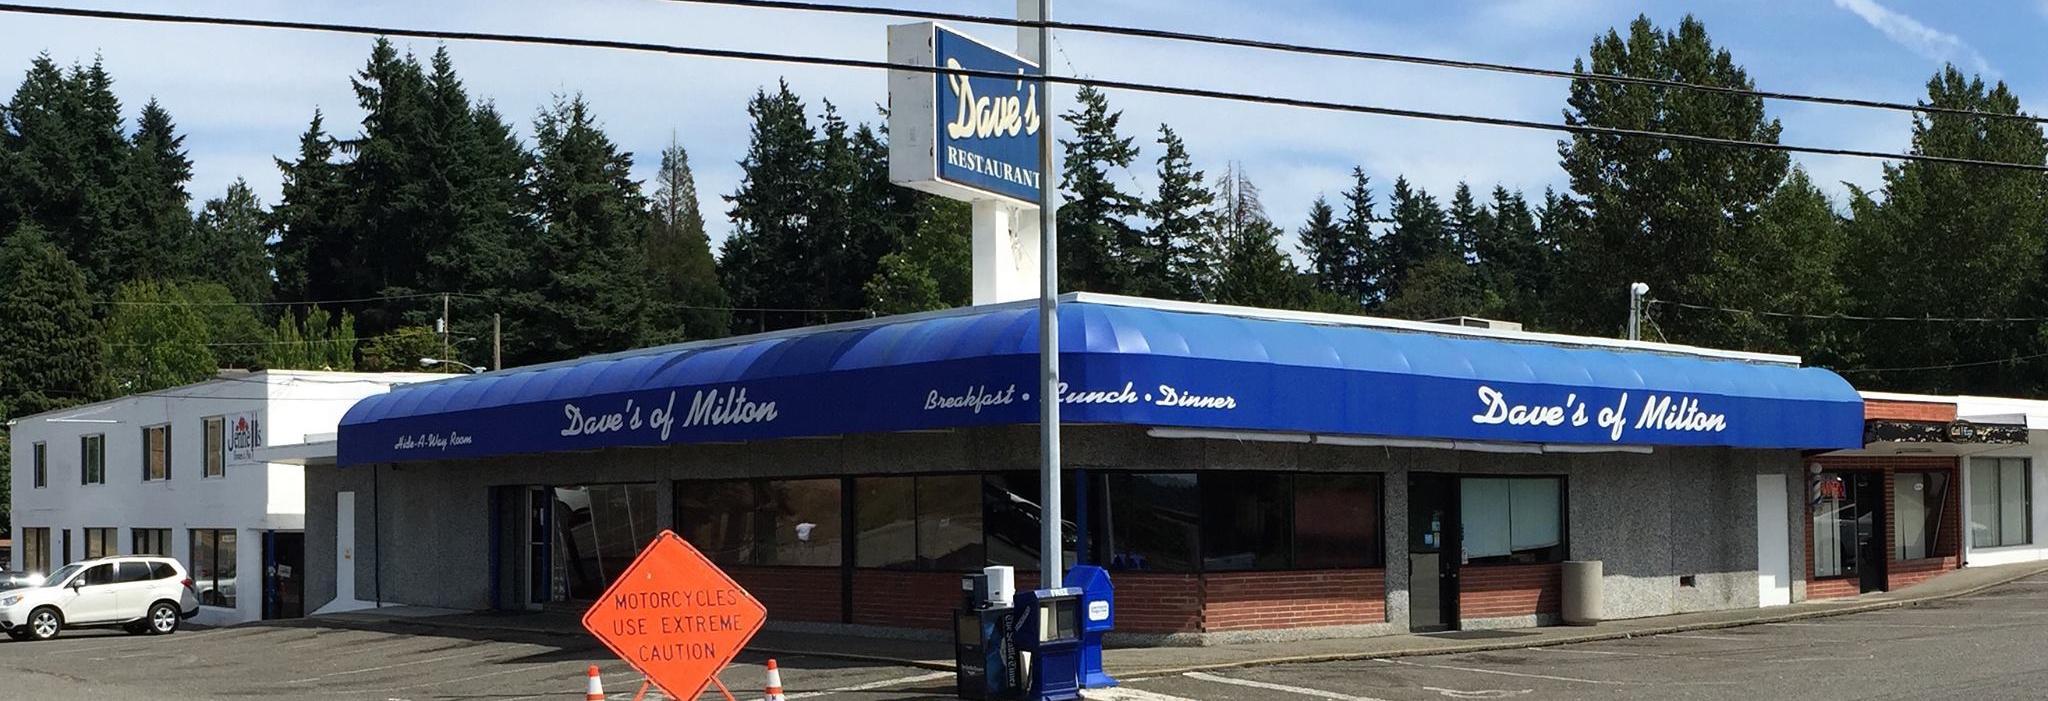 Dave's of Milton Restaurant in Milton, WA banner image